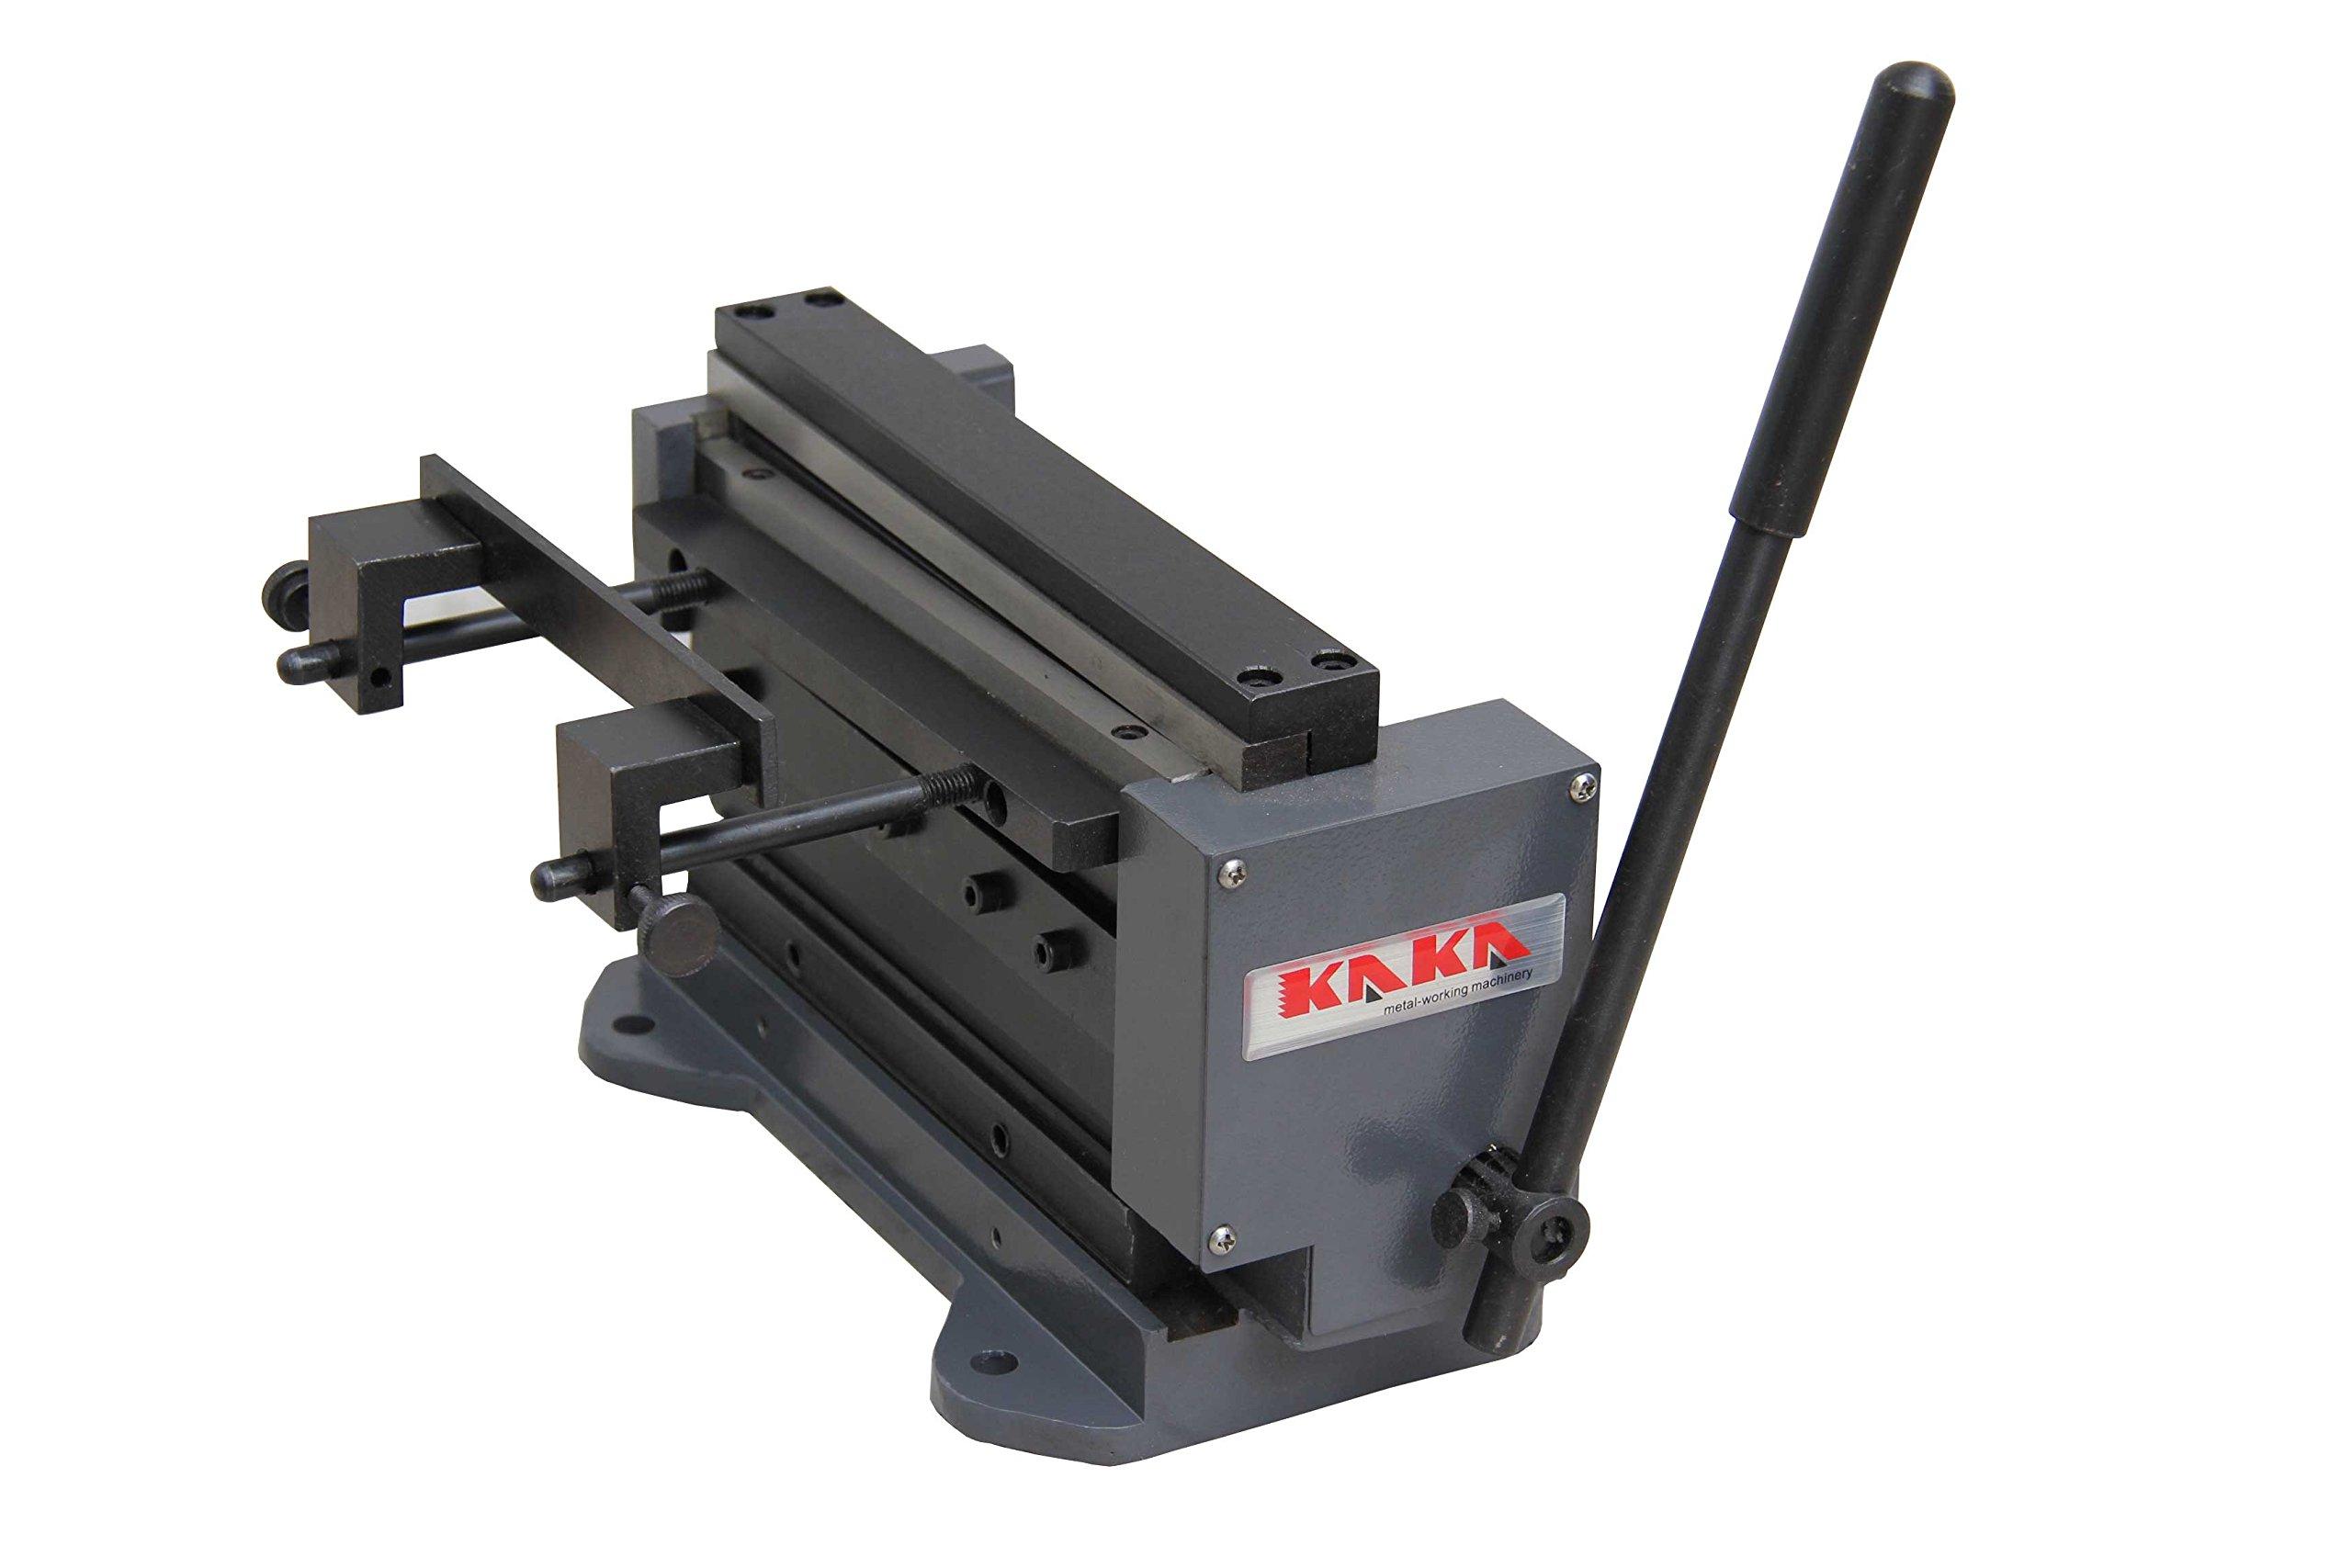 KAKA 8''MINI 8-Inch Manual Mini Shear and Brake Combination, Miniature Compact Manual Sheet Metal Brake and Shear Combination